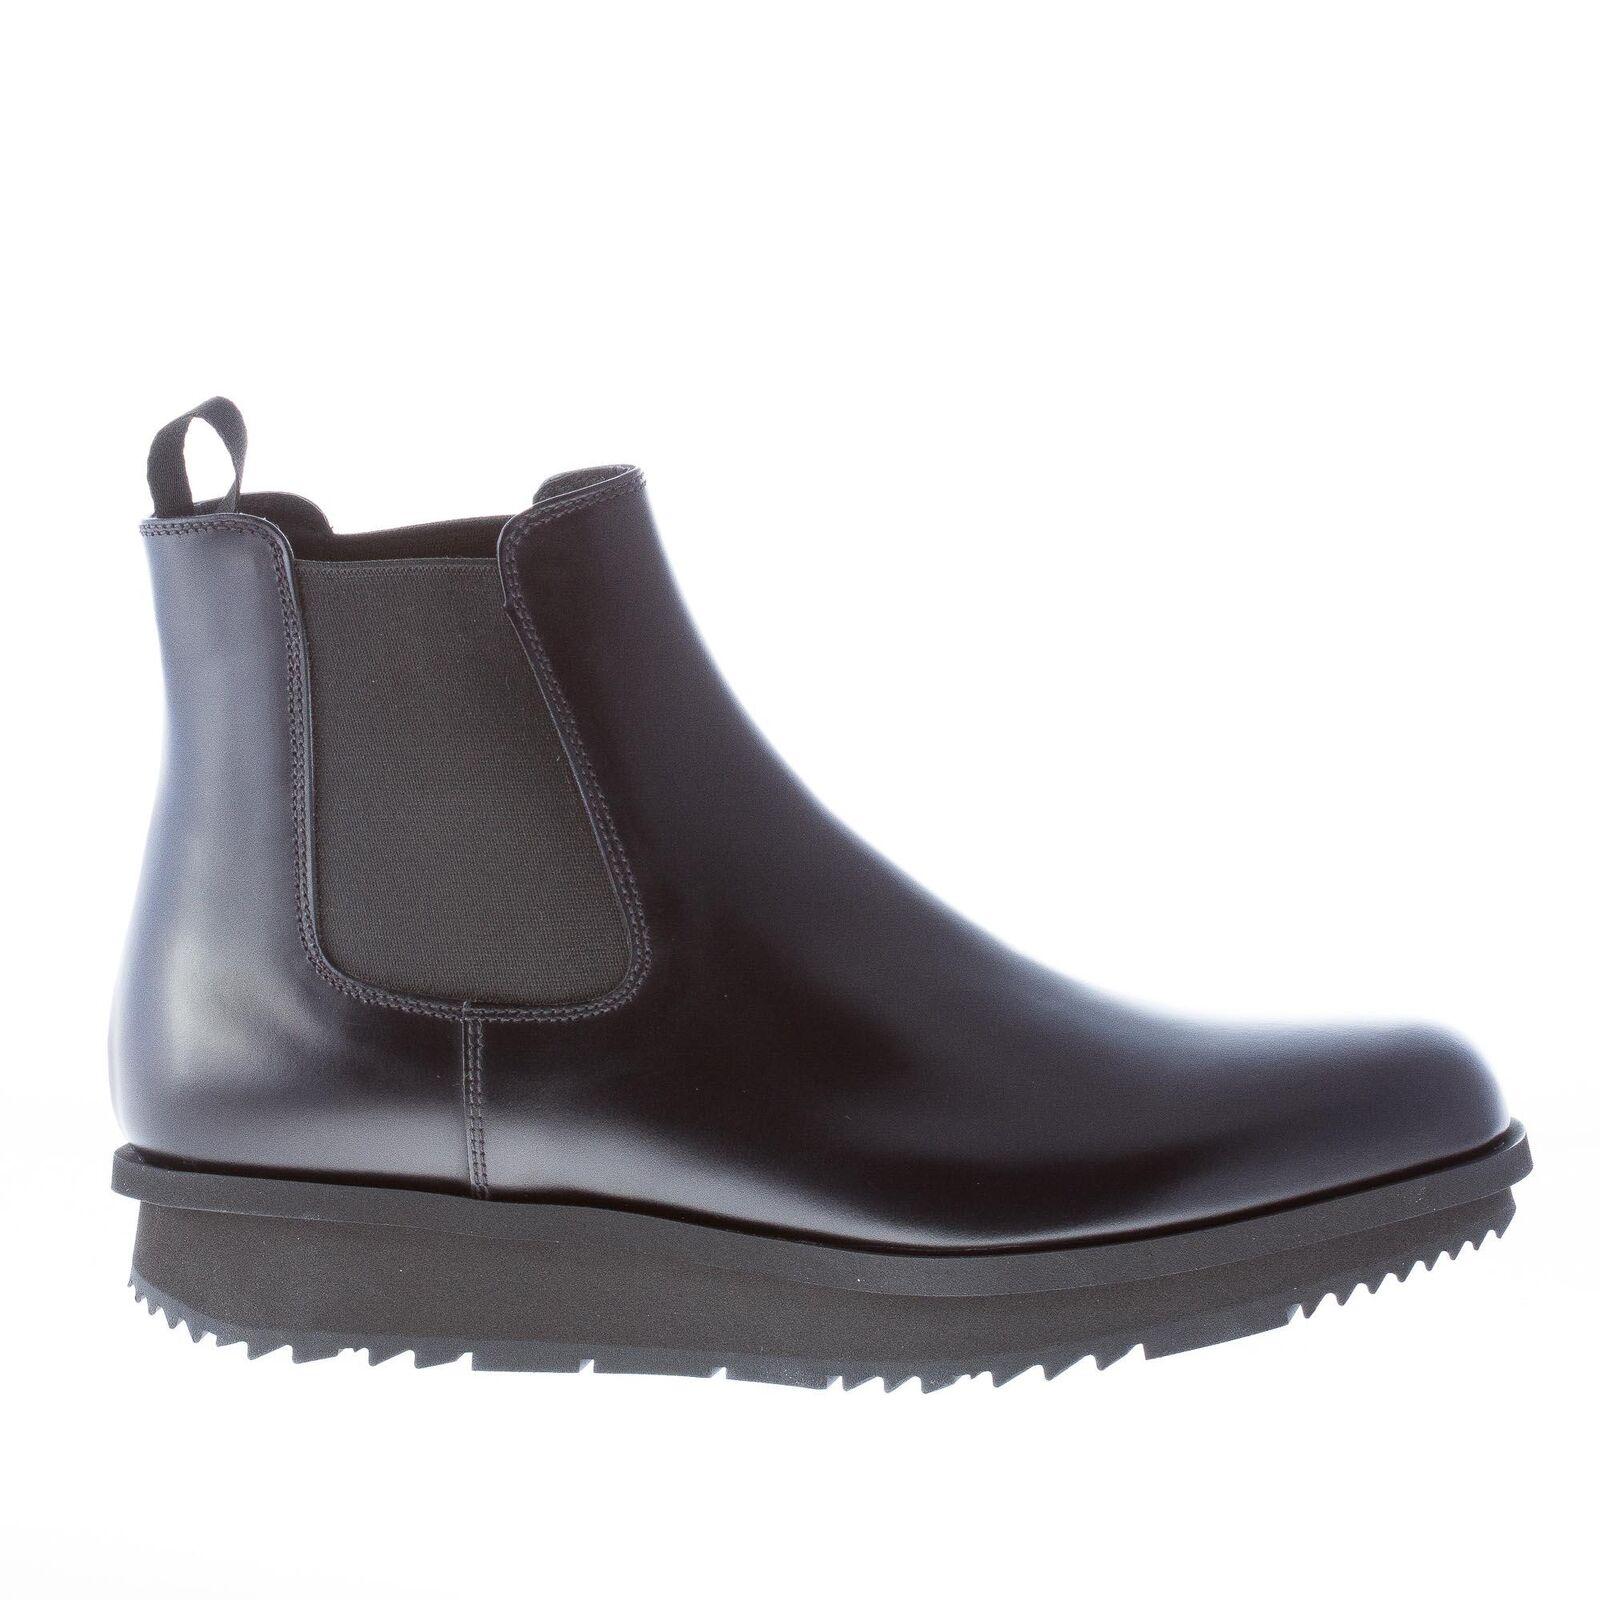 PRADA Hombres Zapatos Negro Cuero Spazzolato   planteado Ligero Suela Chelsea bota